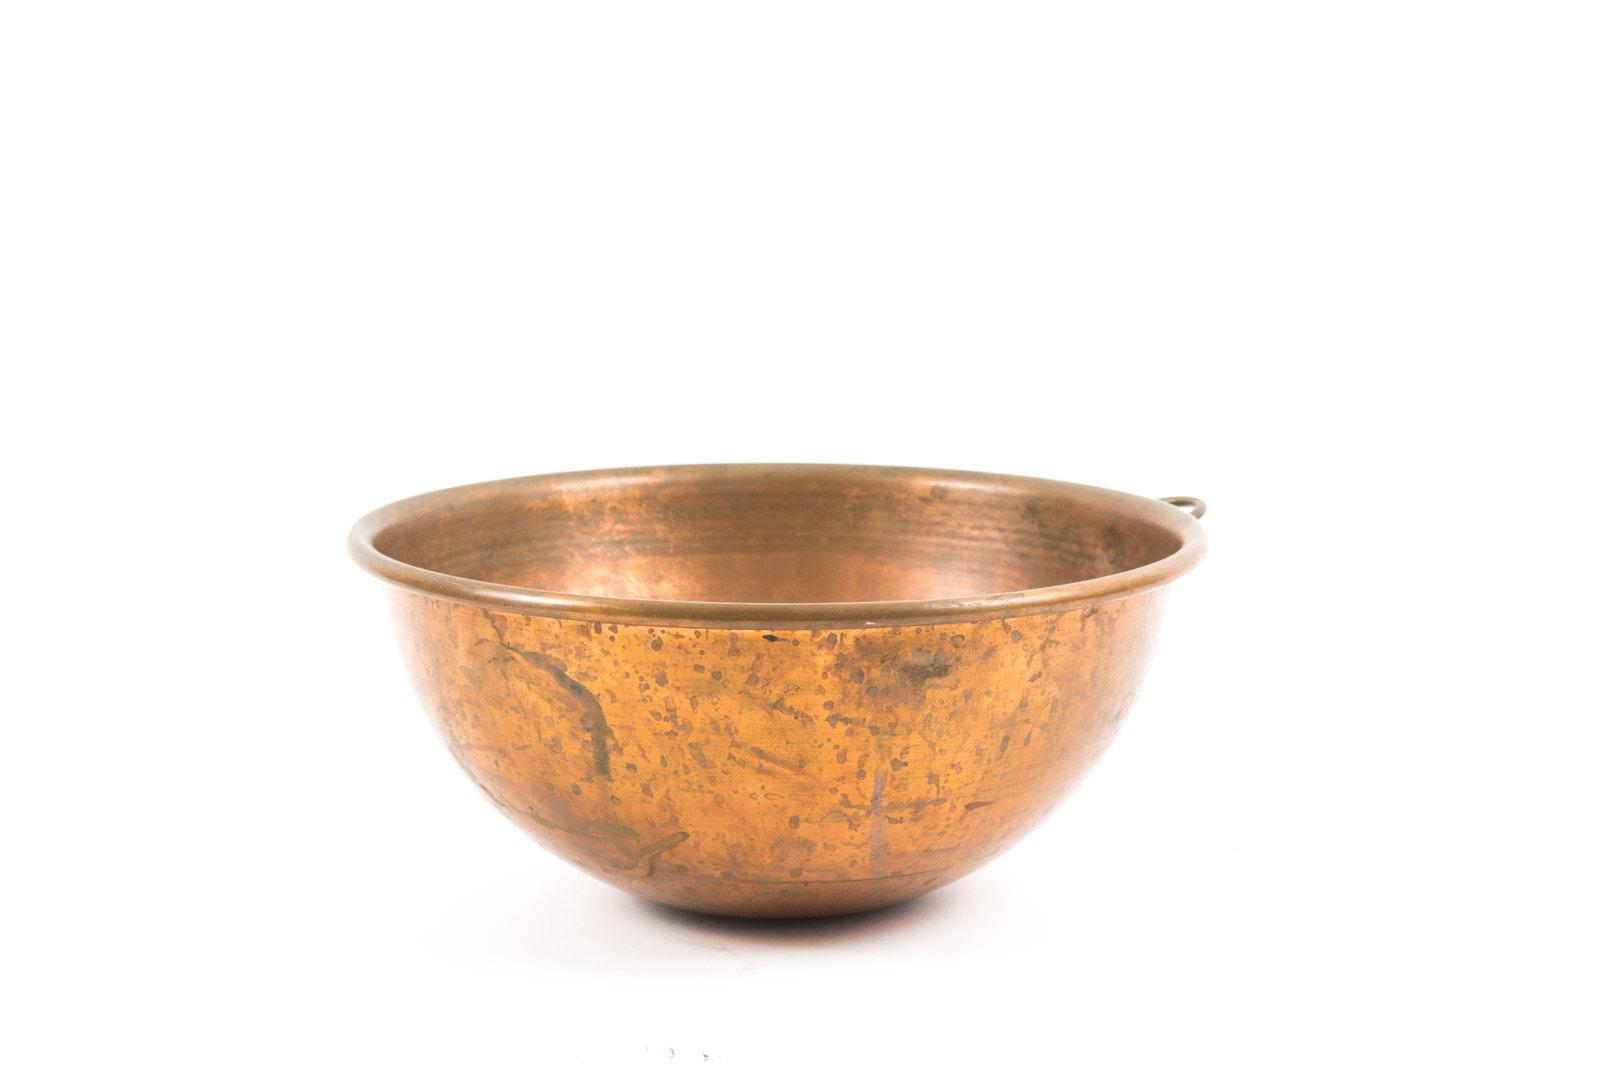 Vintage Copper Mixing Bowl